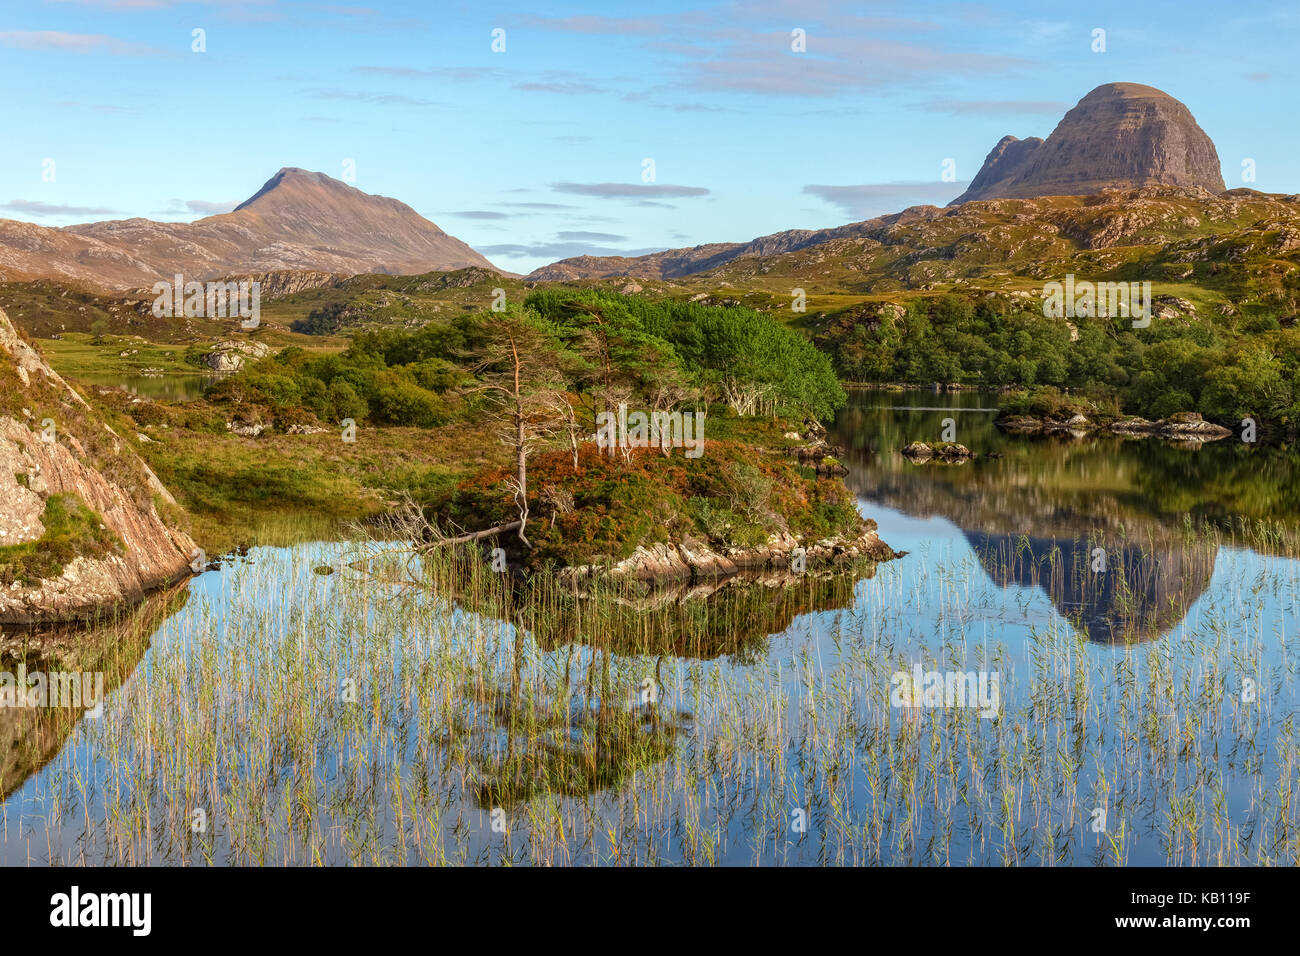 Loch Druim Suardalain, Assynt, Sutherland, Scotland, United Kingdom Stock Photo